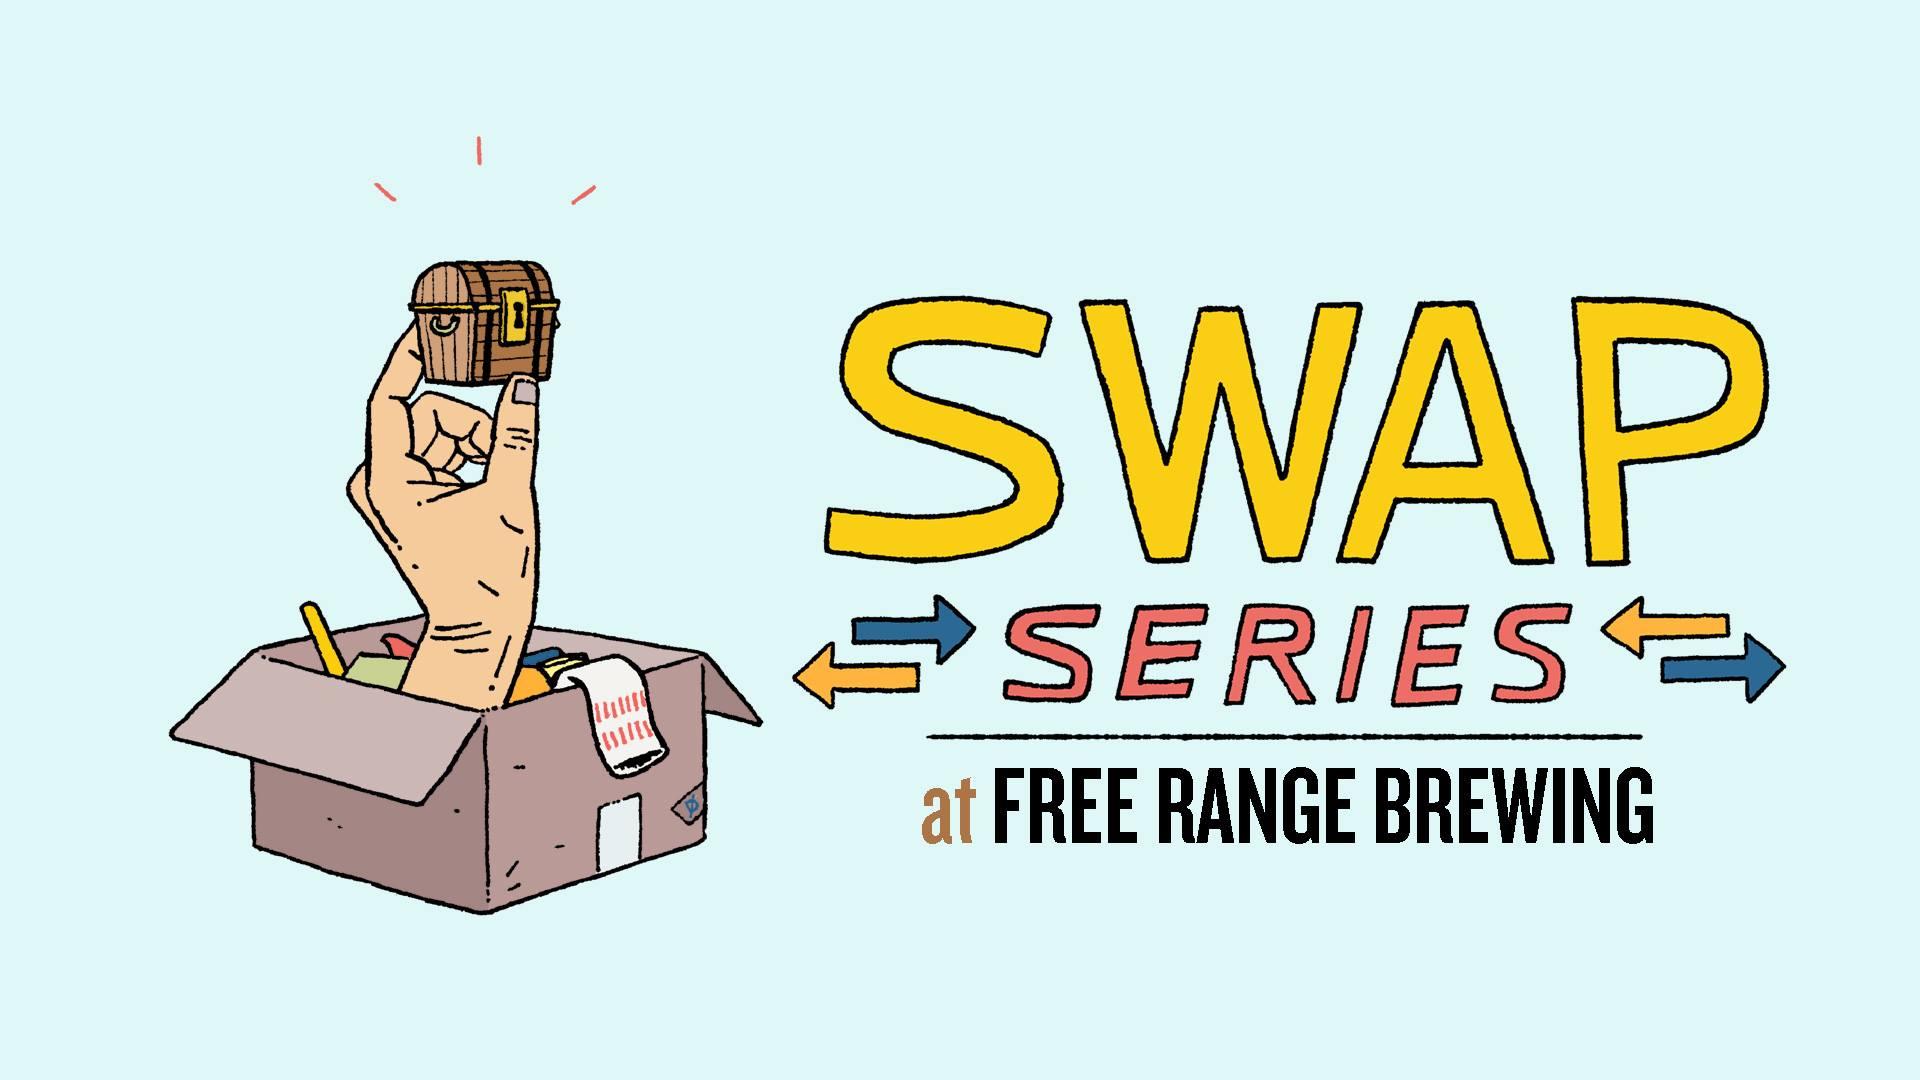 Swap Series: Book Swap